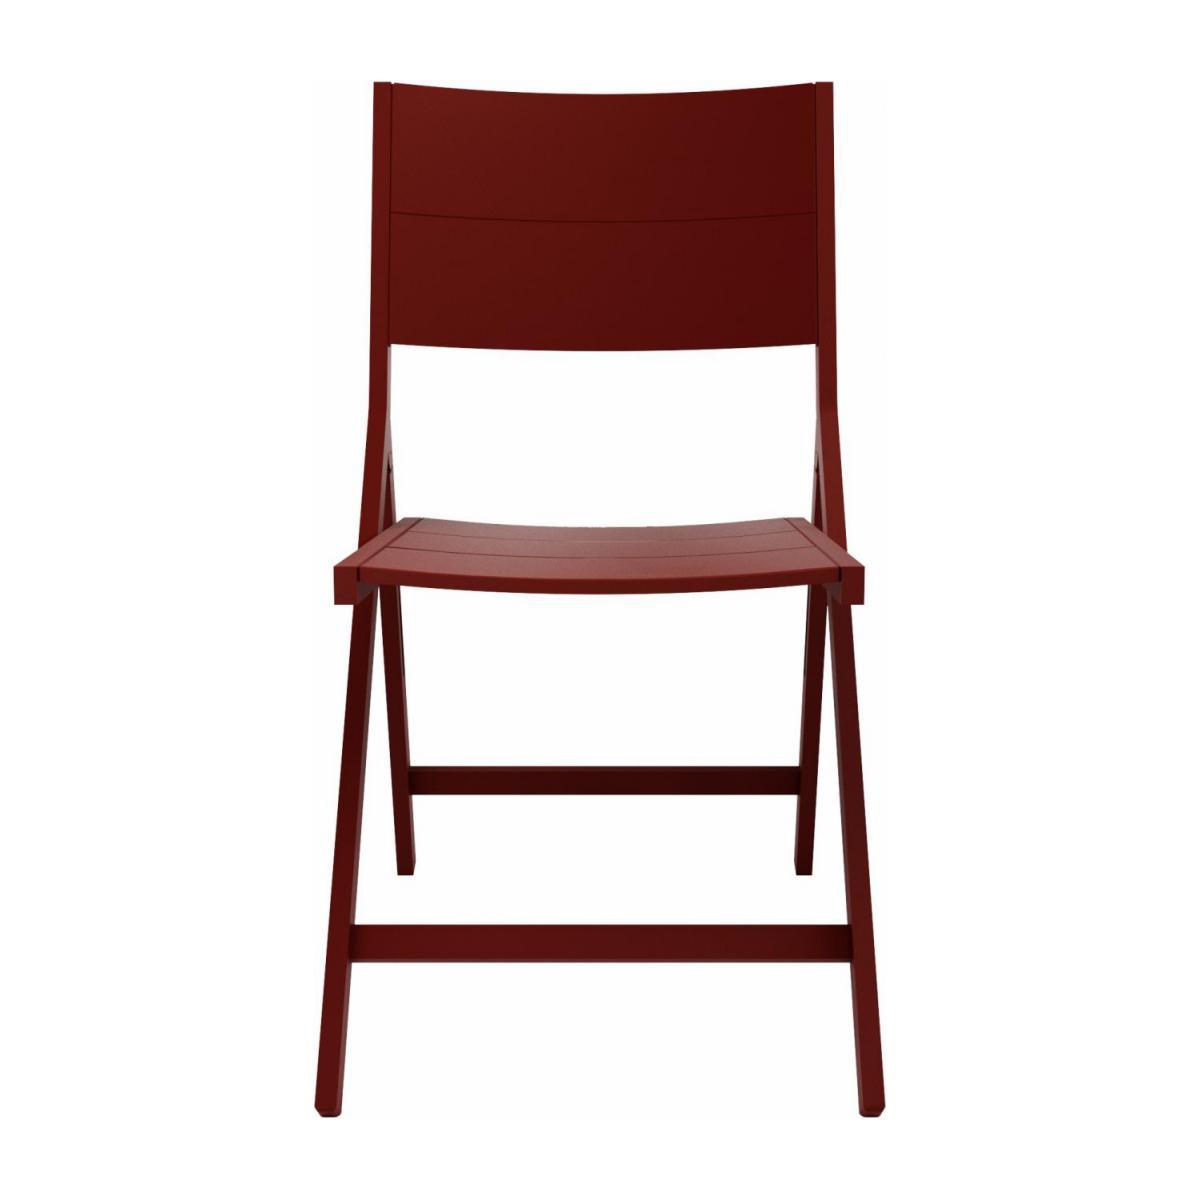 Full Size of Lounge Klappstuhl Petra Aus Aluminium Rot Habitat Möbel Garten Sessel Sofa Loungemöbel Holz Günstig Set Wohnzimmer Lounge Klappstuhl